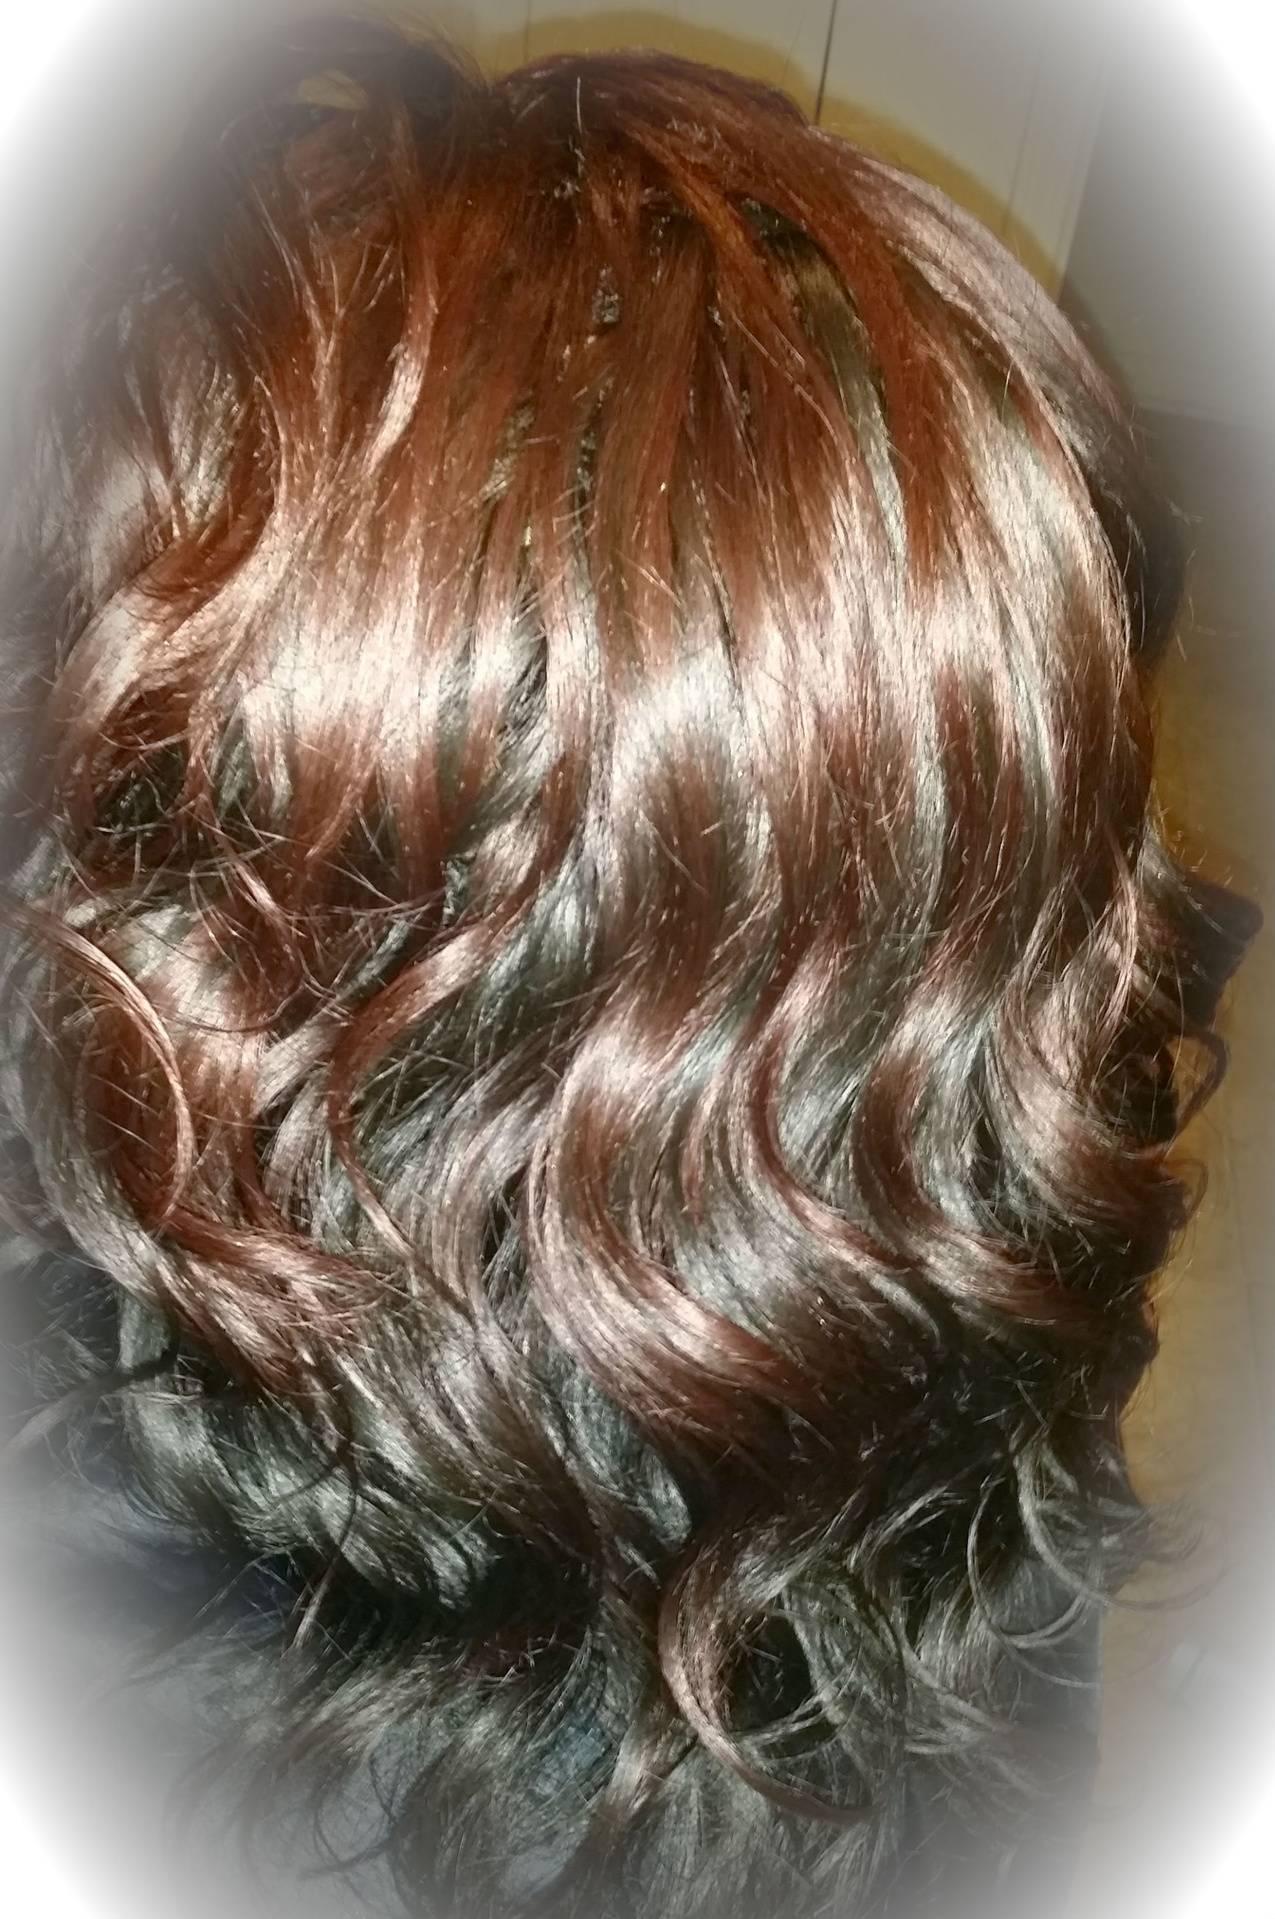 100% yaky human hair (layered and curled)